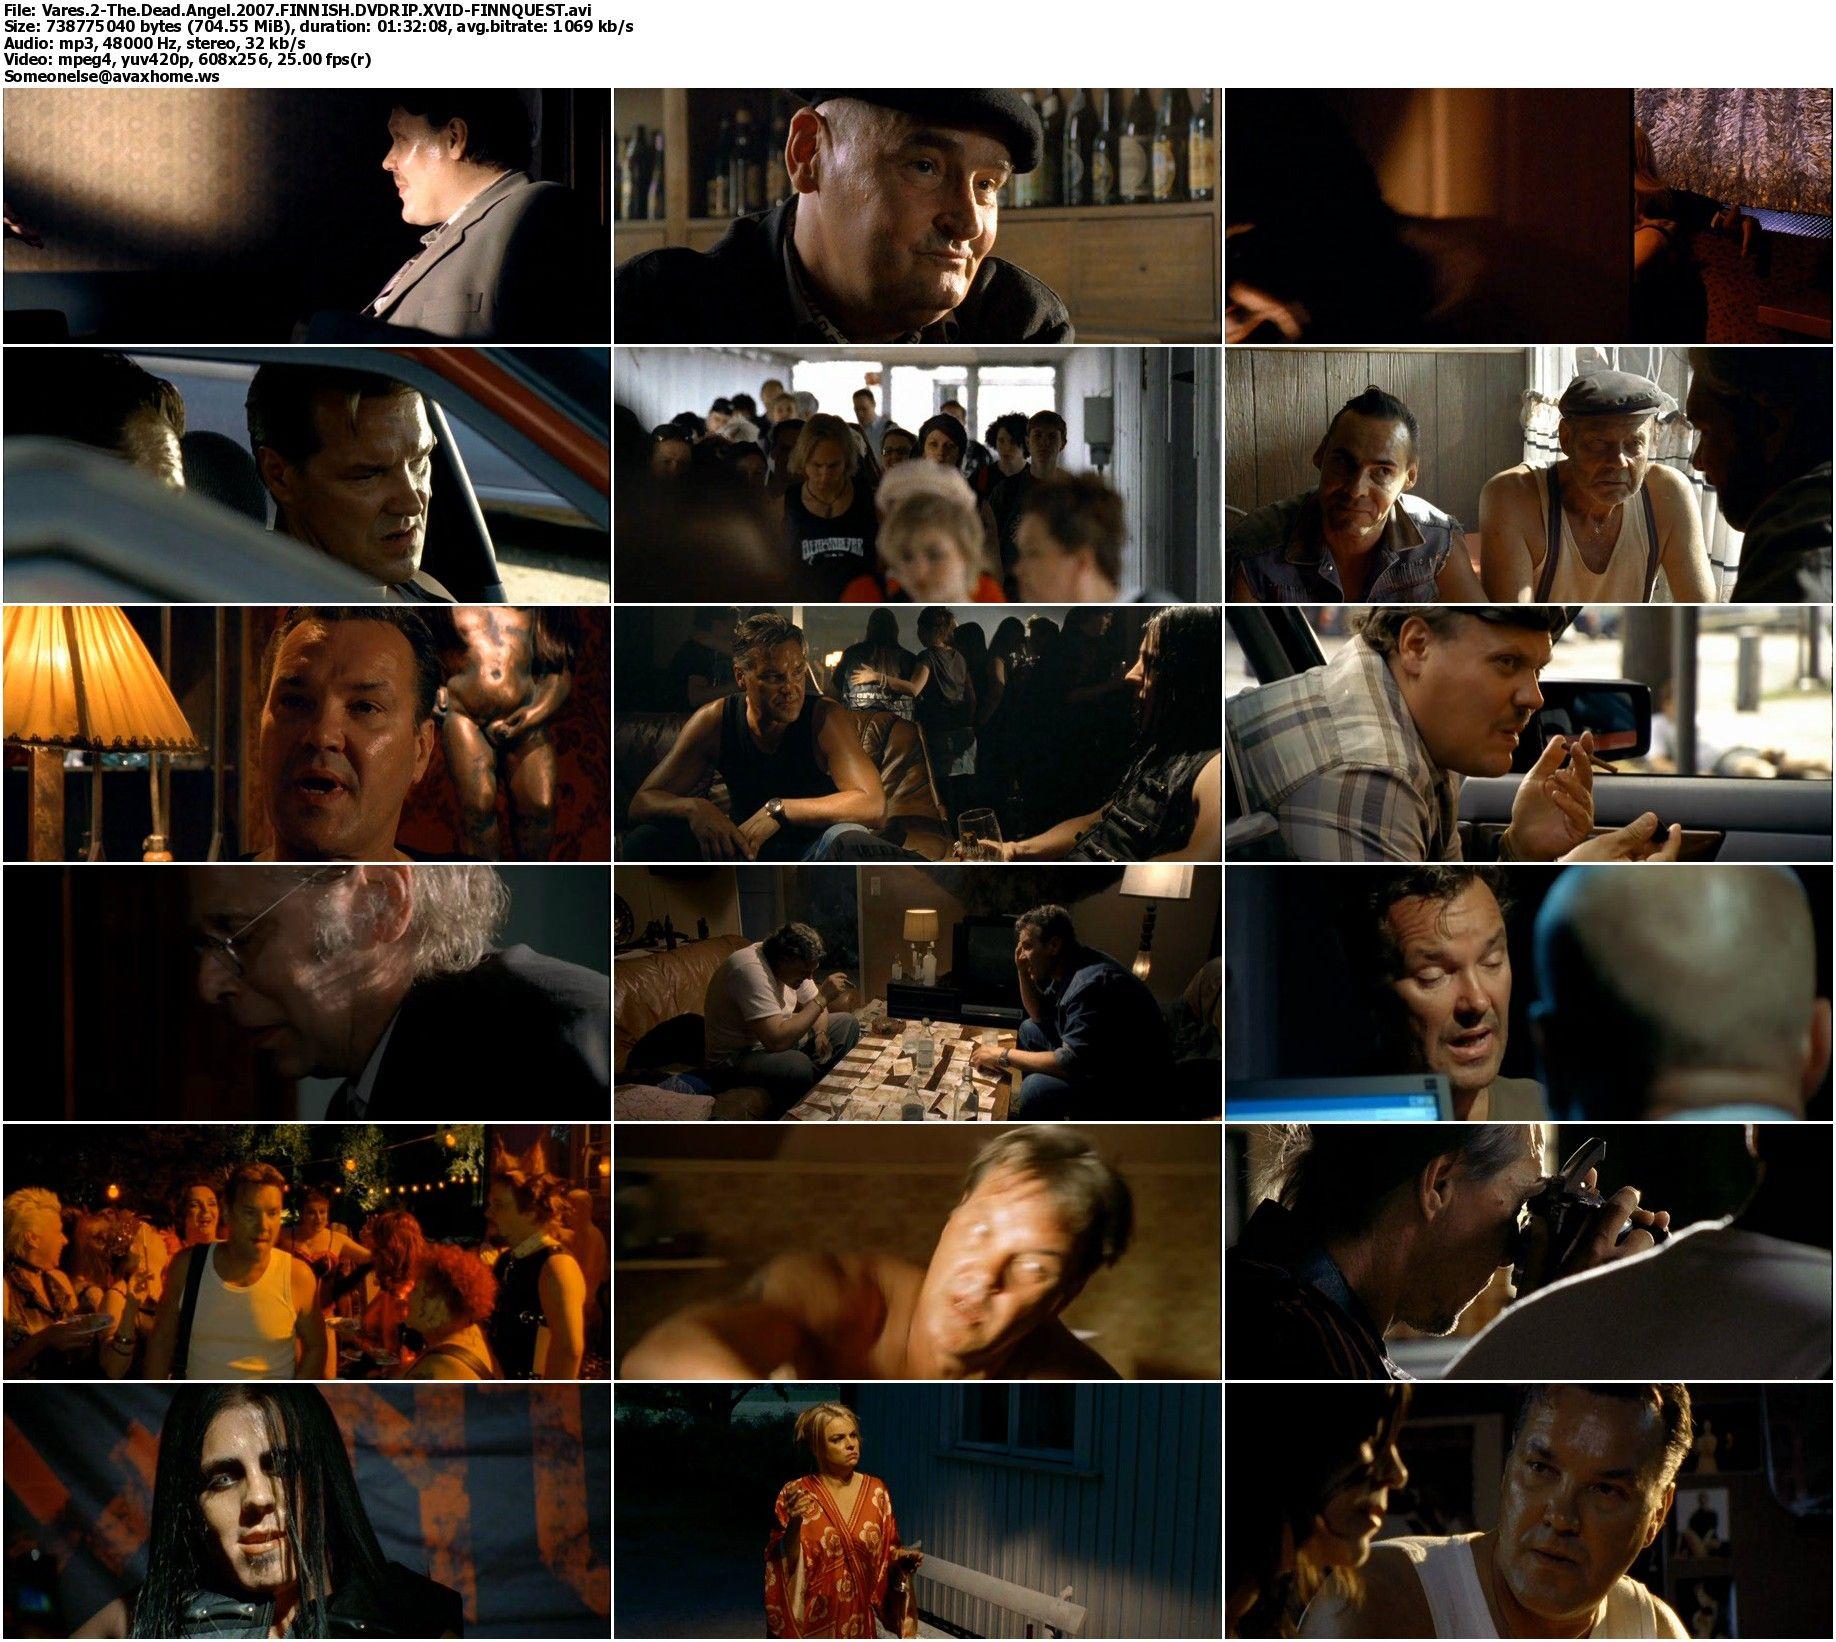 V2: Dead Angel (2007)